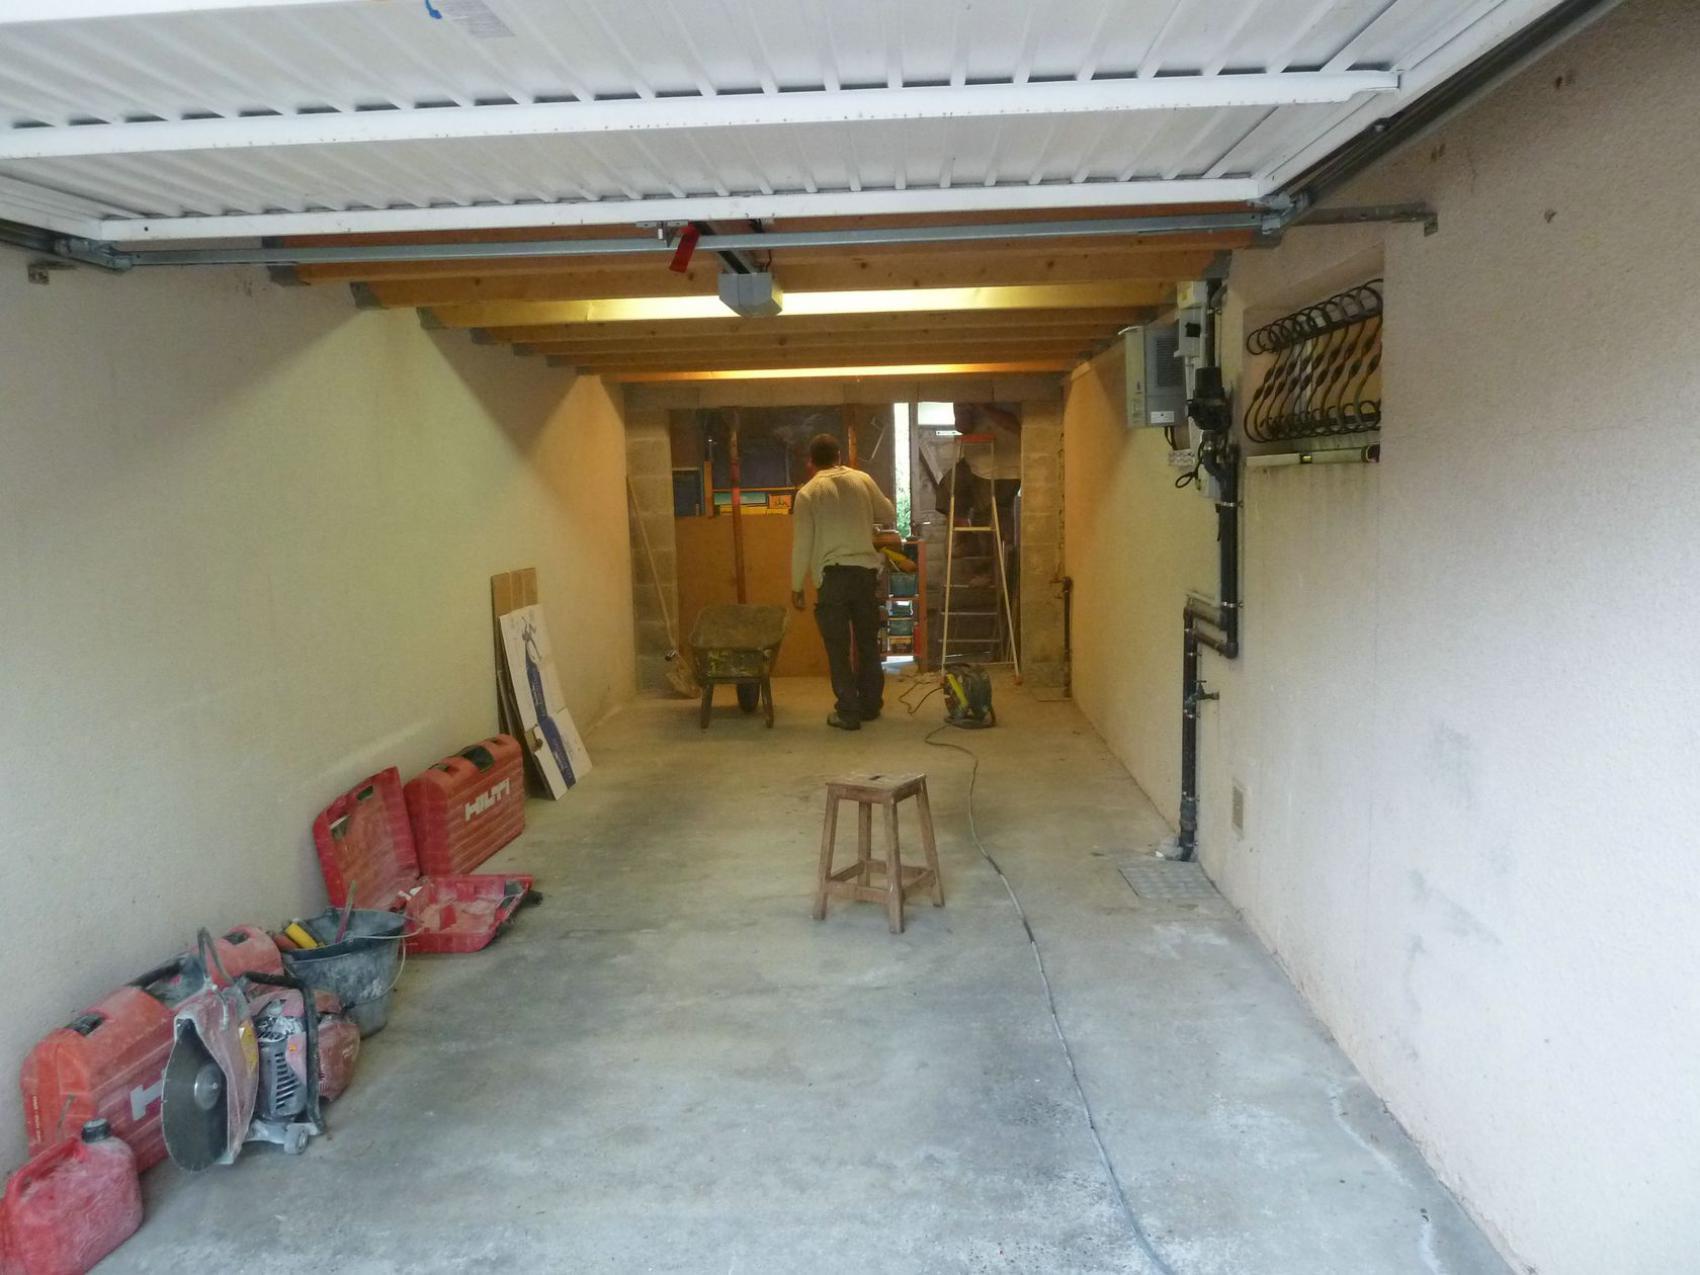 travaux de transformation d 39 une garage en studio la rochelle. Black Bedroom Furniture Sets. Home Design Ideas